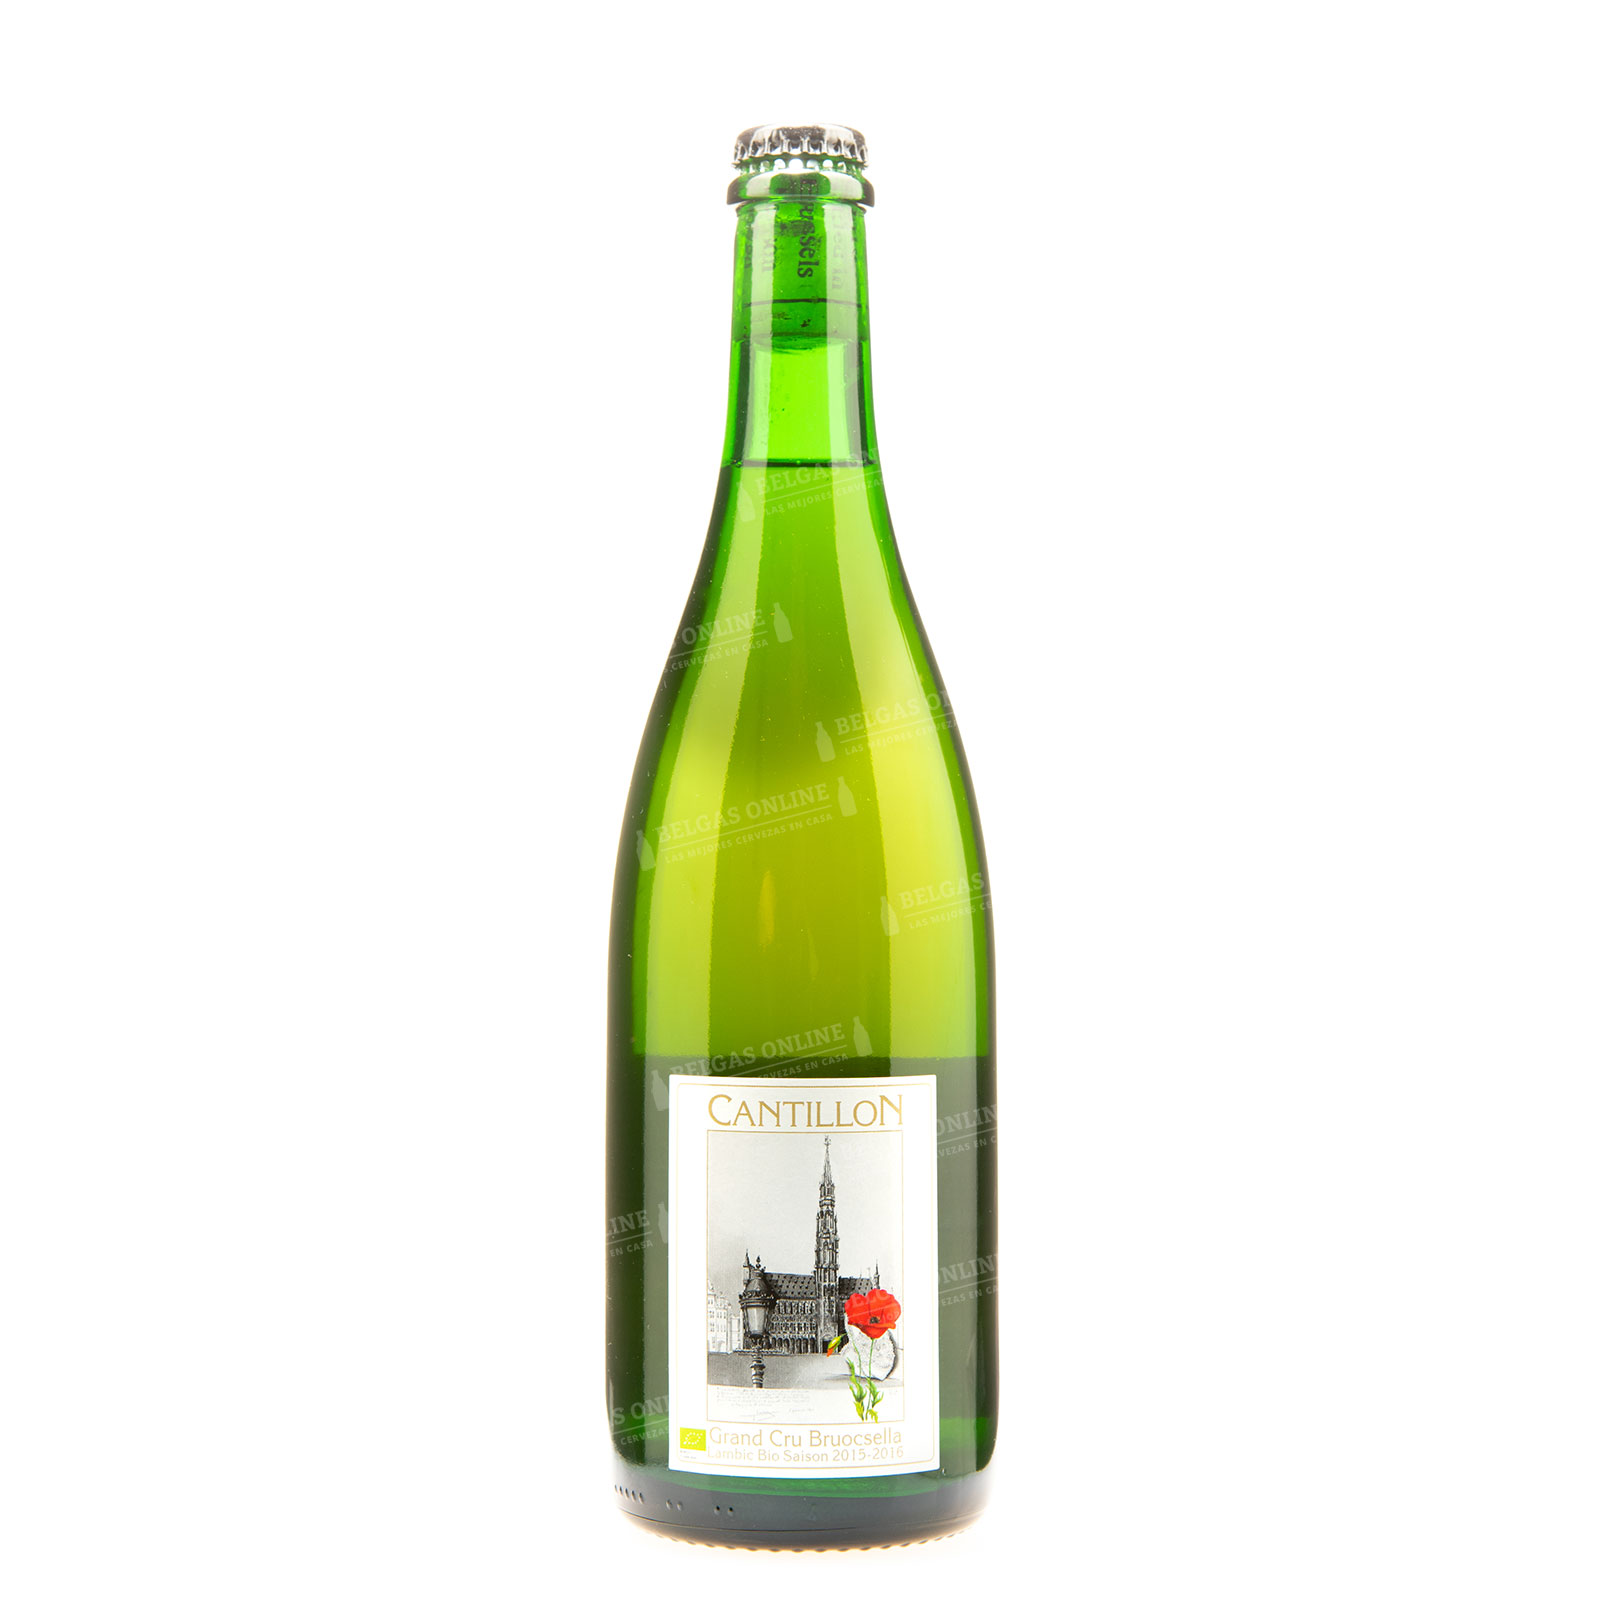 Cantillon Bruocsella 15